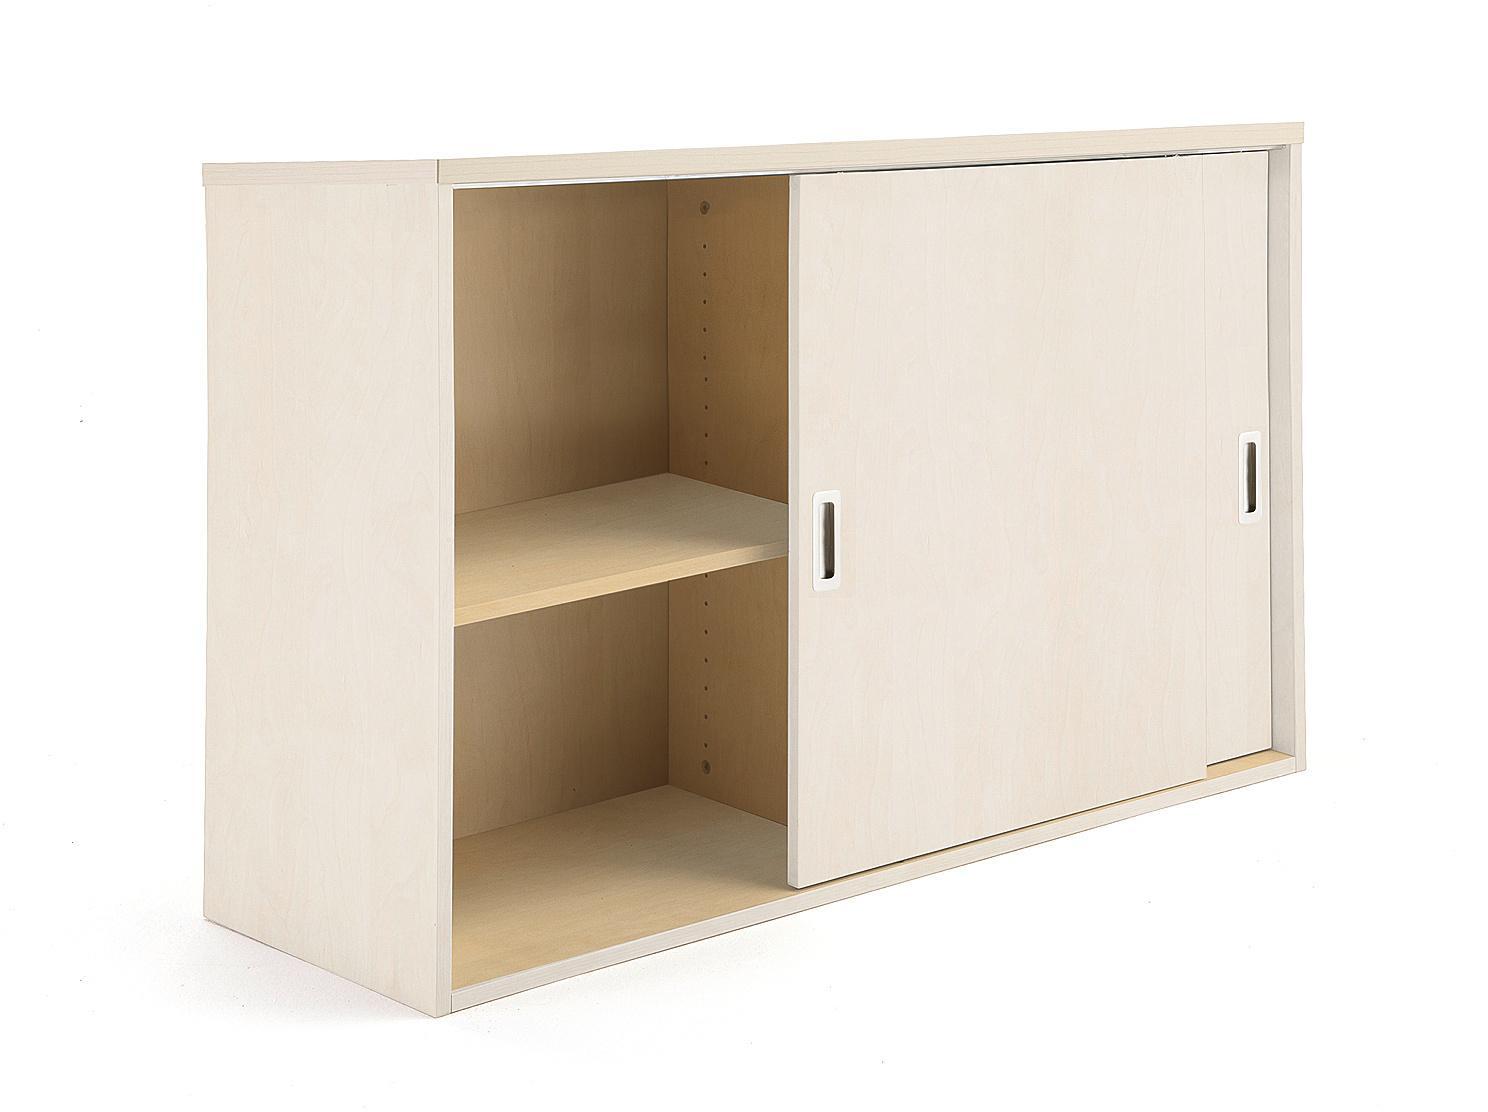 Kancelárska skriňa Modulus s posuvnými dverami, 800x1200 mm, breza